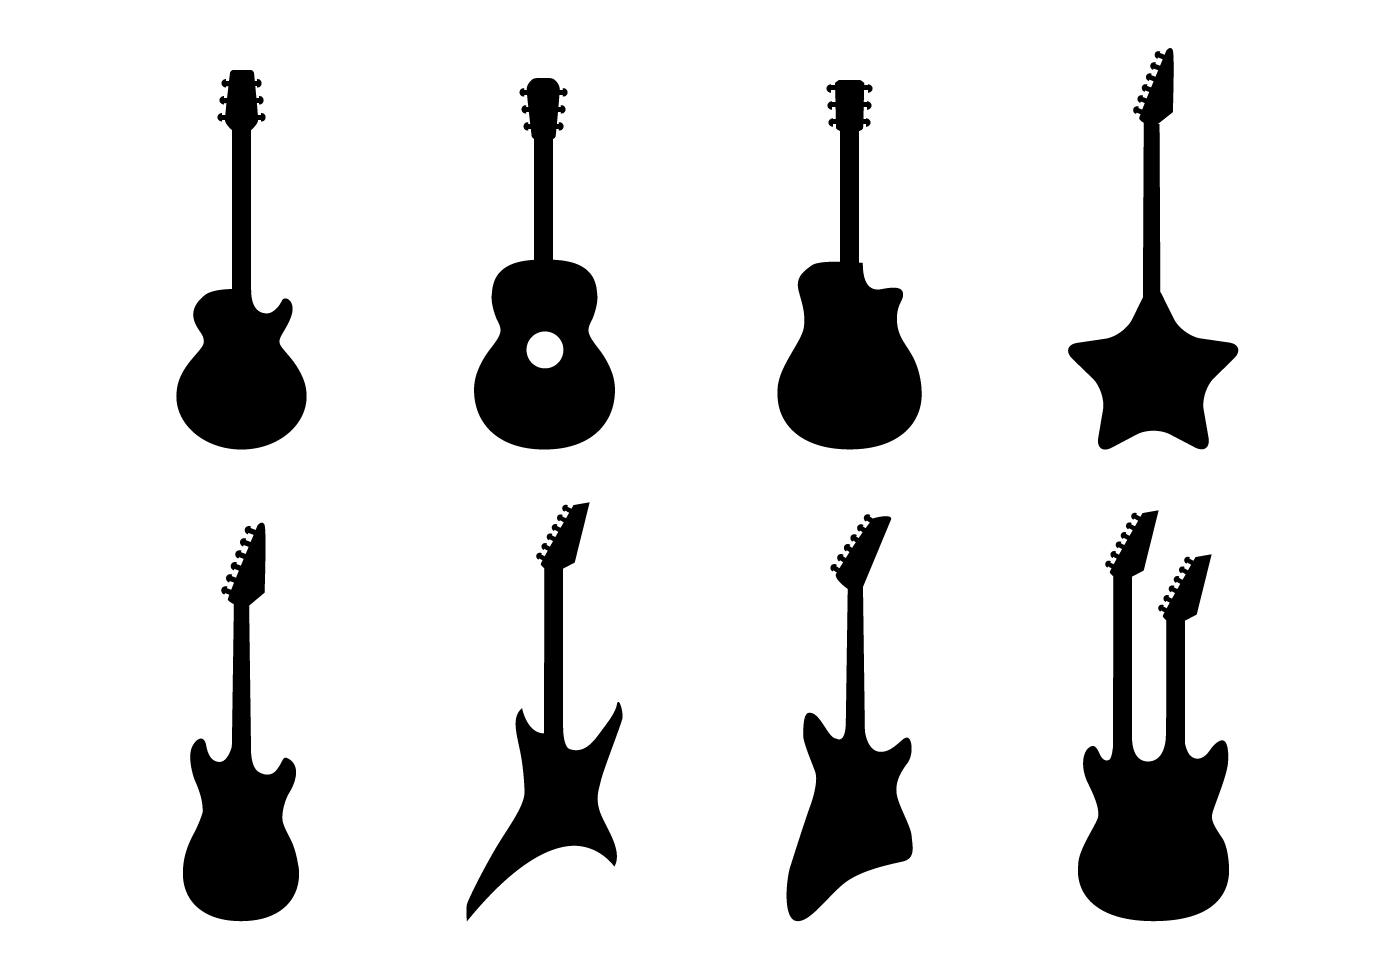 Download Guitar Vector Vector Art Choose From Over A Million Free Vectors Clipart Graphics Vector Art Images Des Guitar Vector Guitar Outline Music Symbols